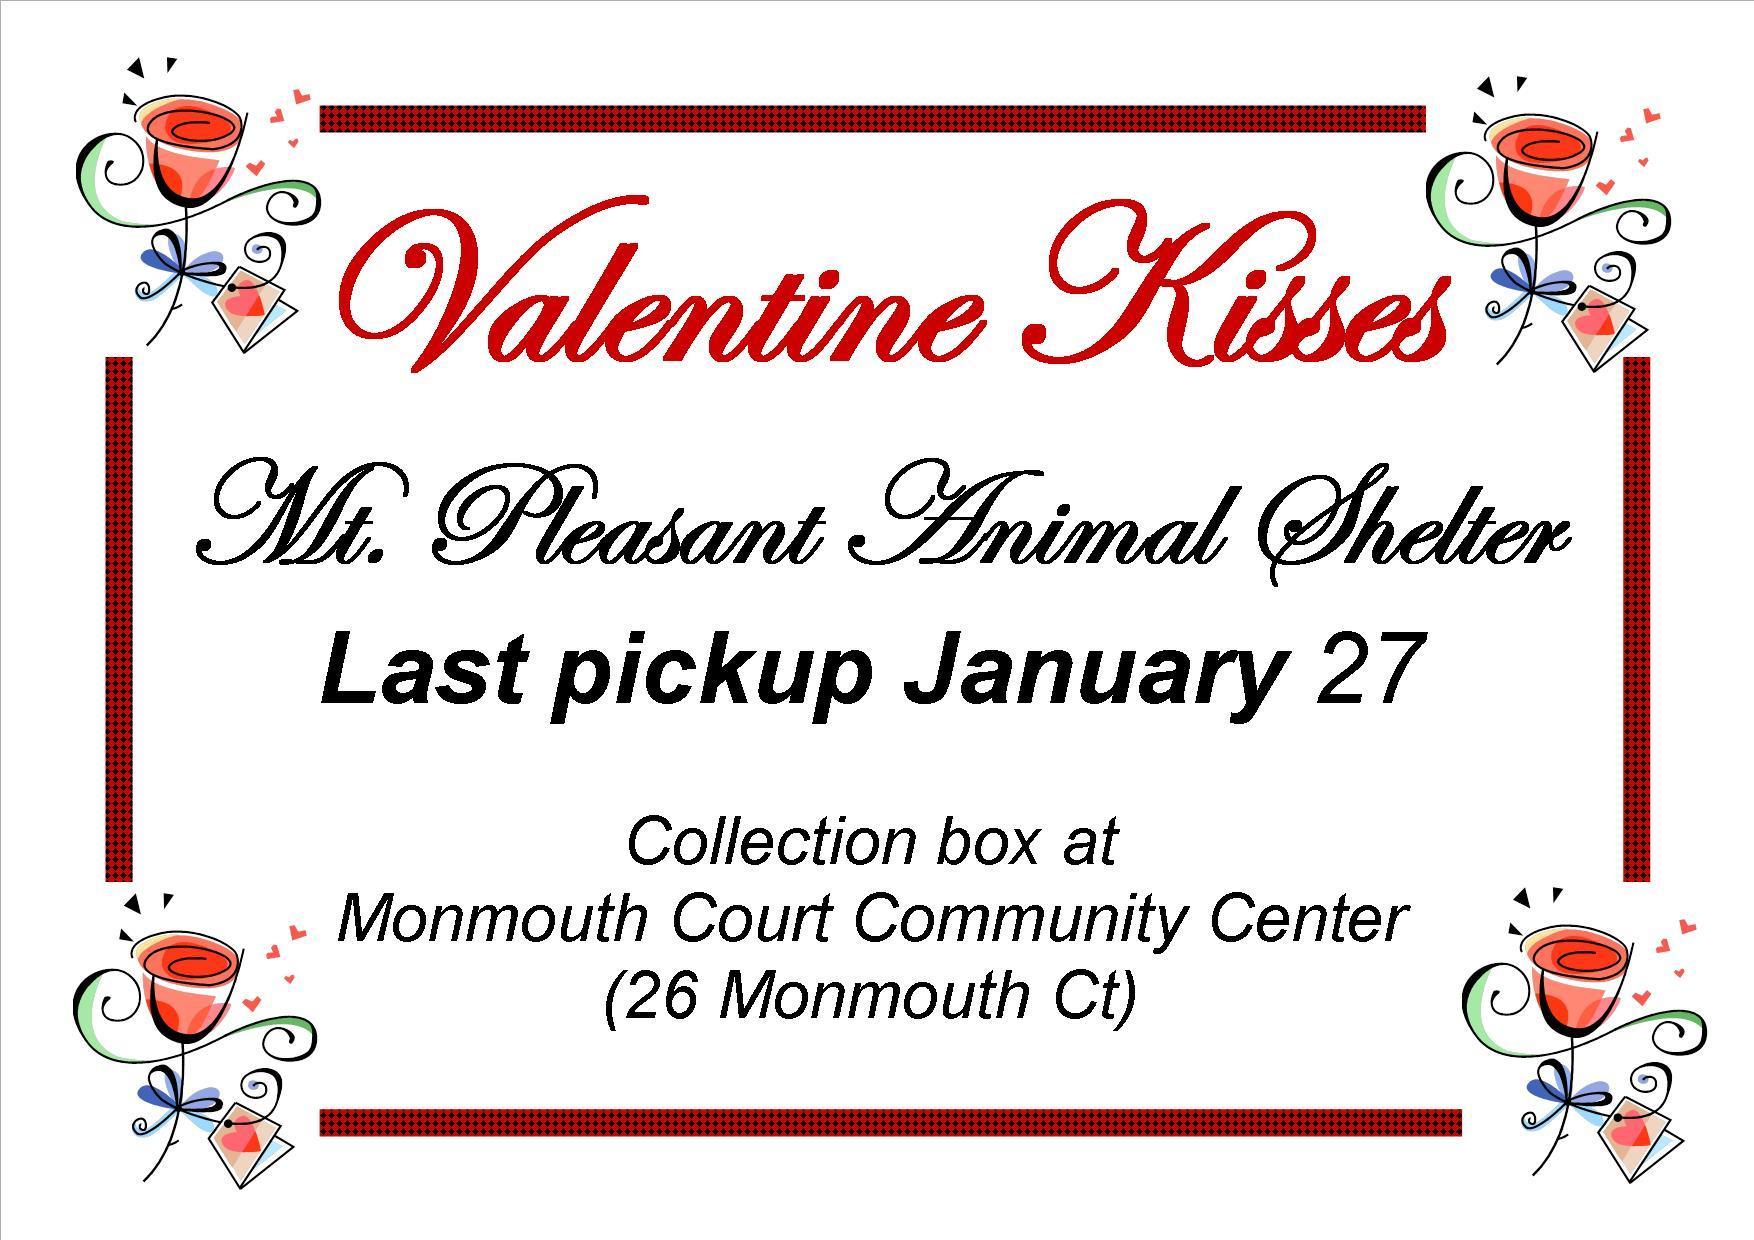 635022cec20614b24754_Valentine_kisses.jpg